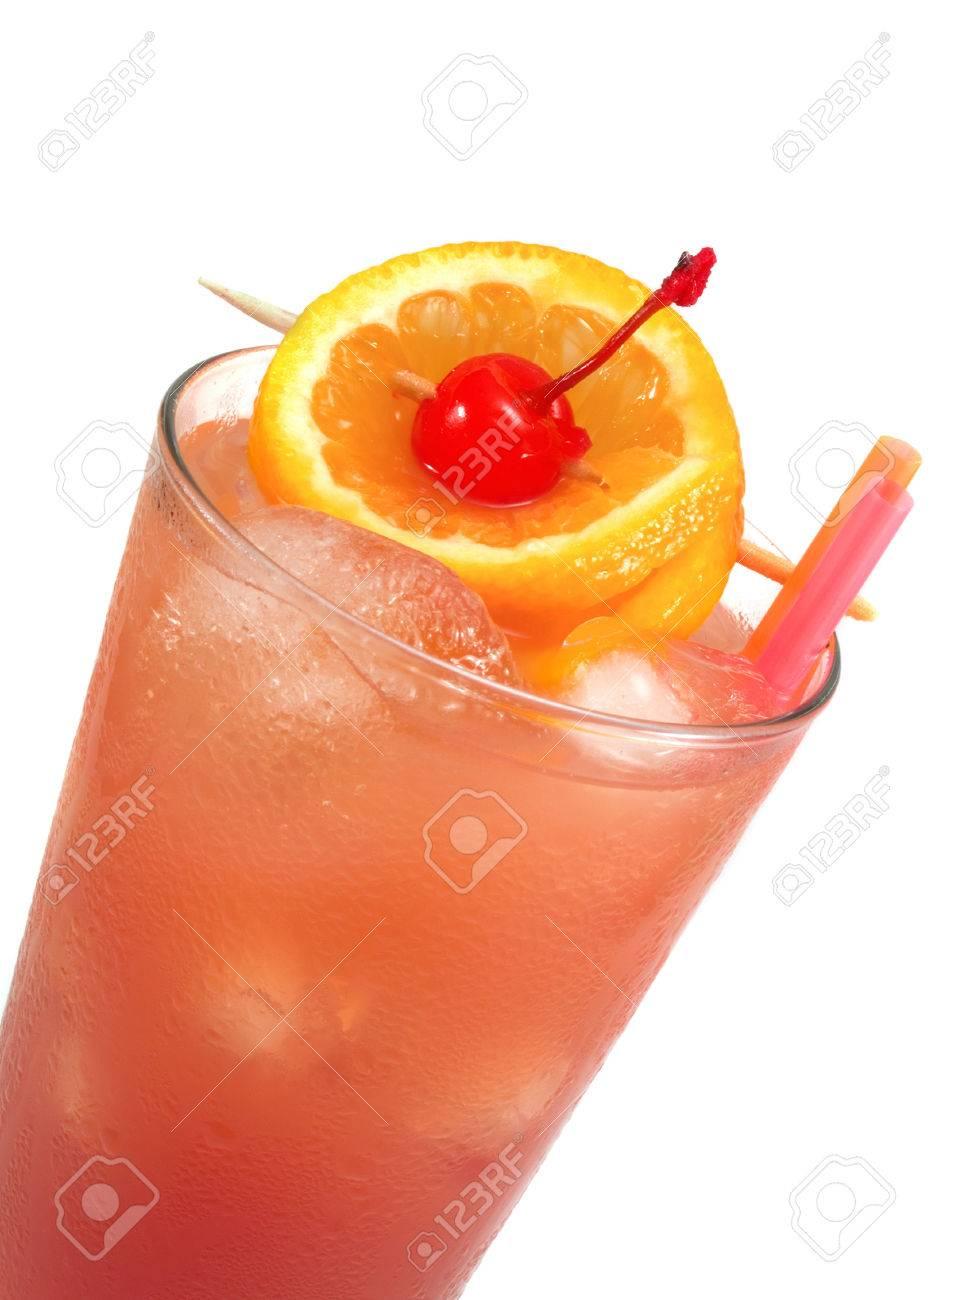 Vodka cranberry orange juice peach schnapps